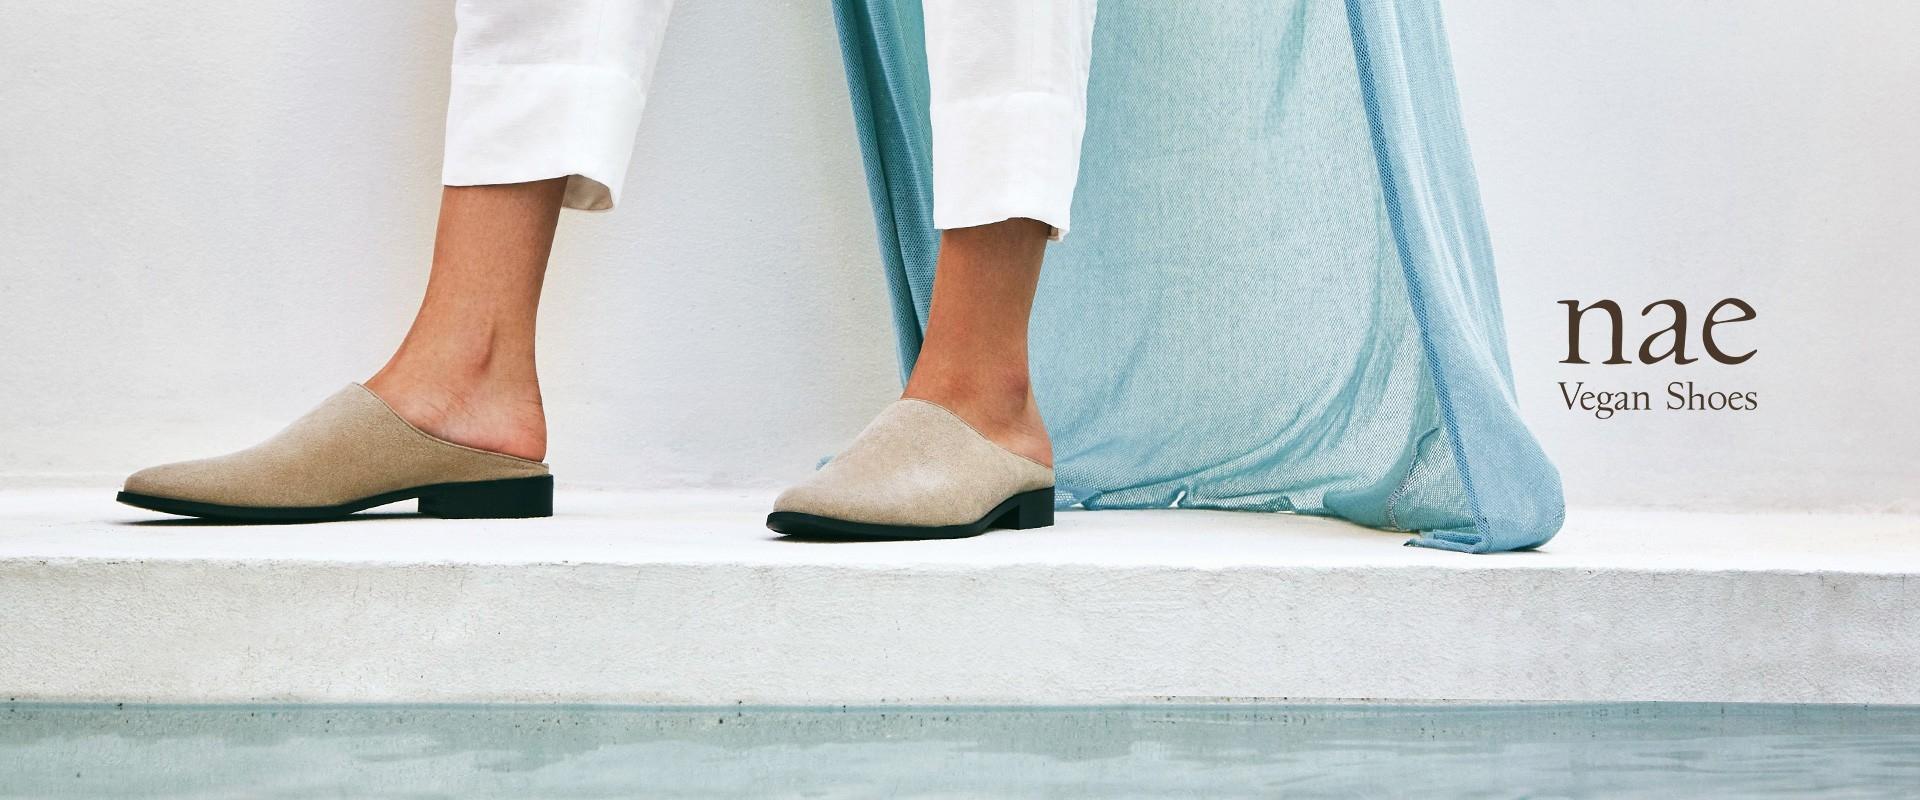 Nae ZOE ciabatta mocassino Donna sabot vegan shoes